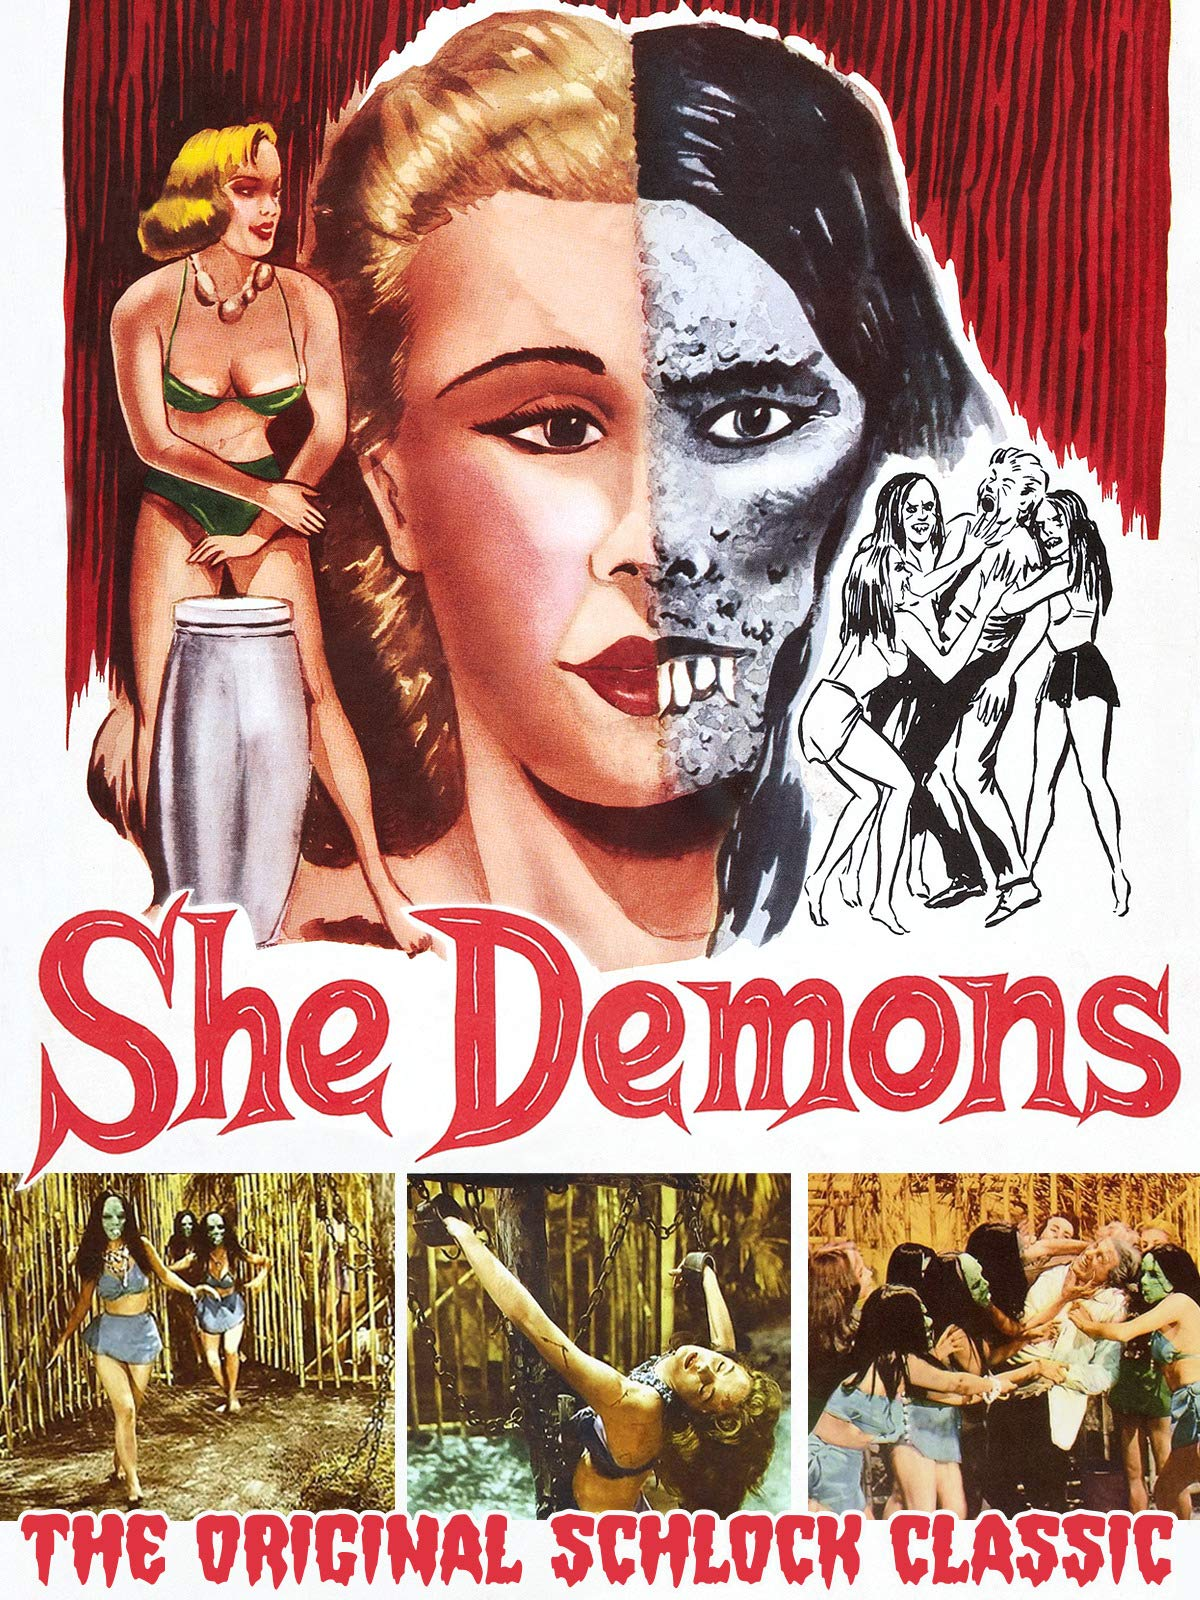 She Demons - The Original Schlock Classic